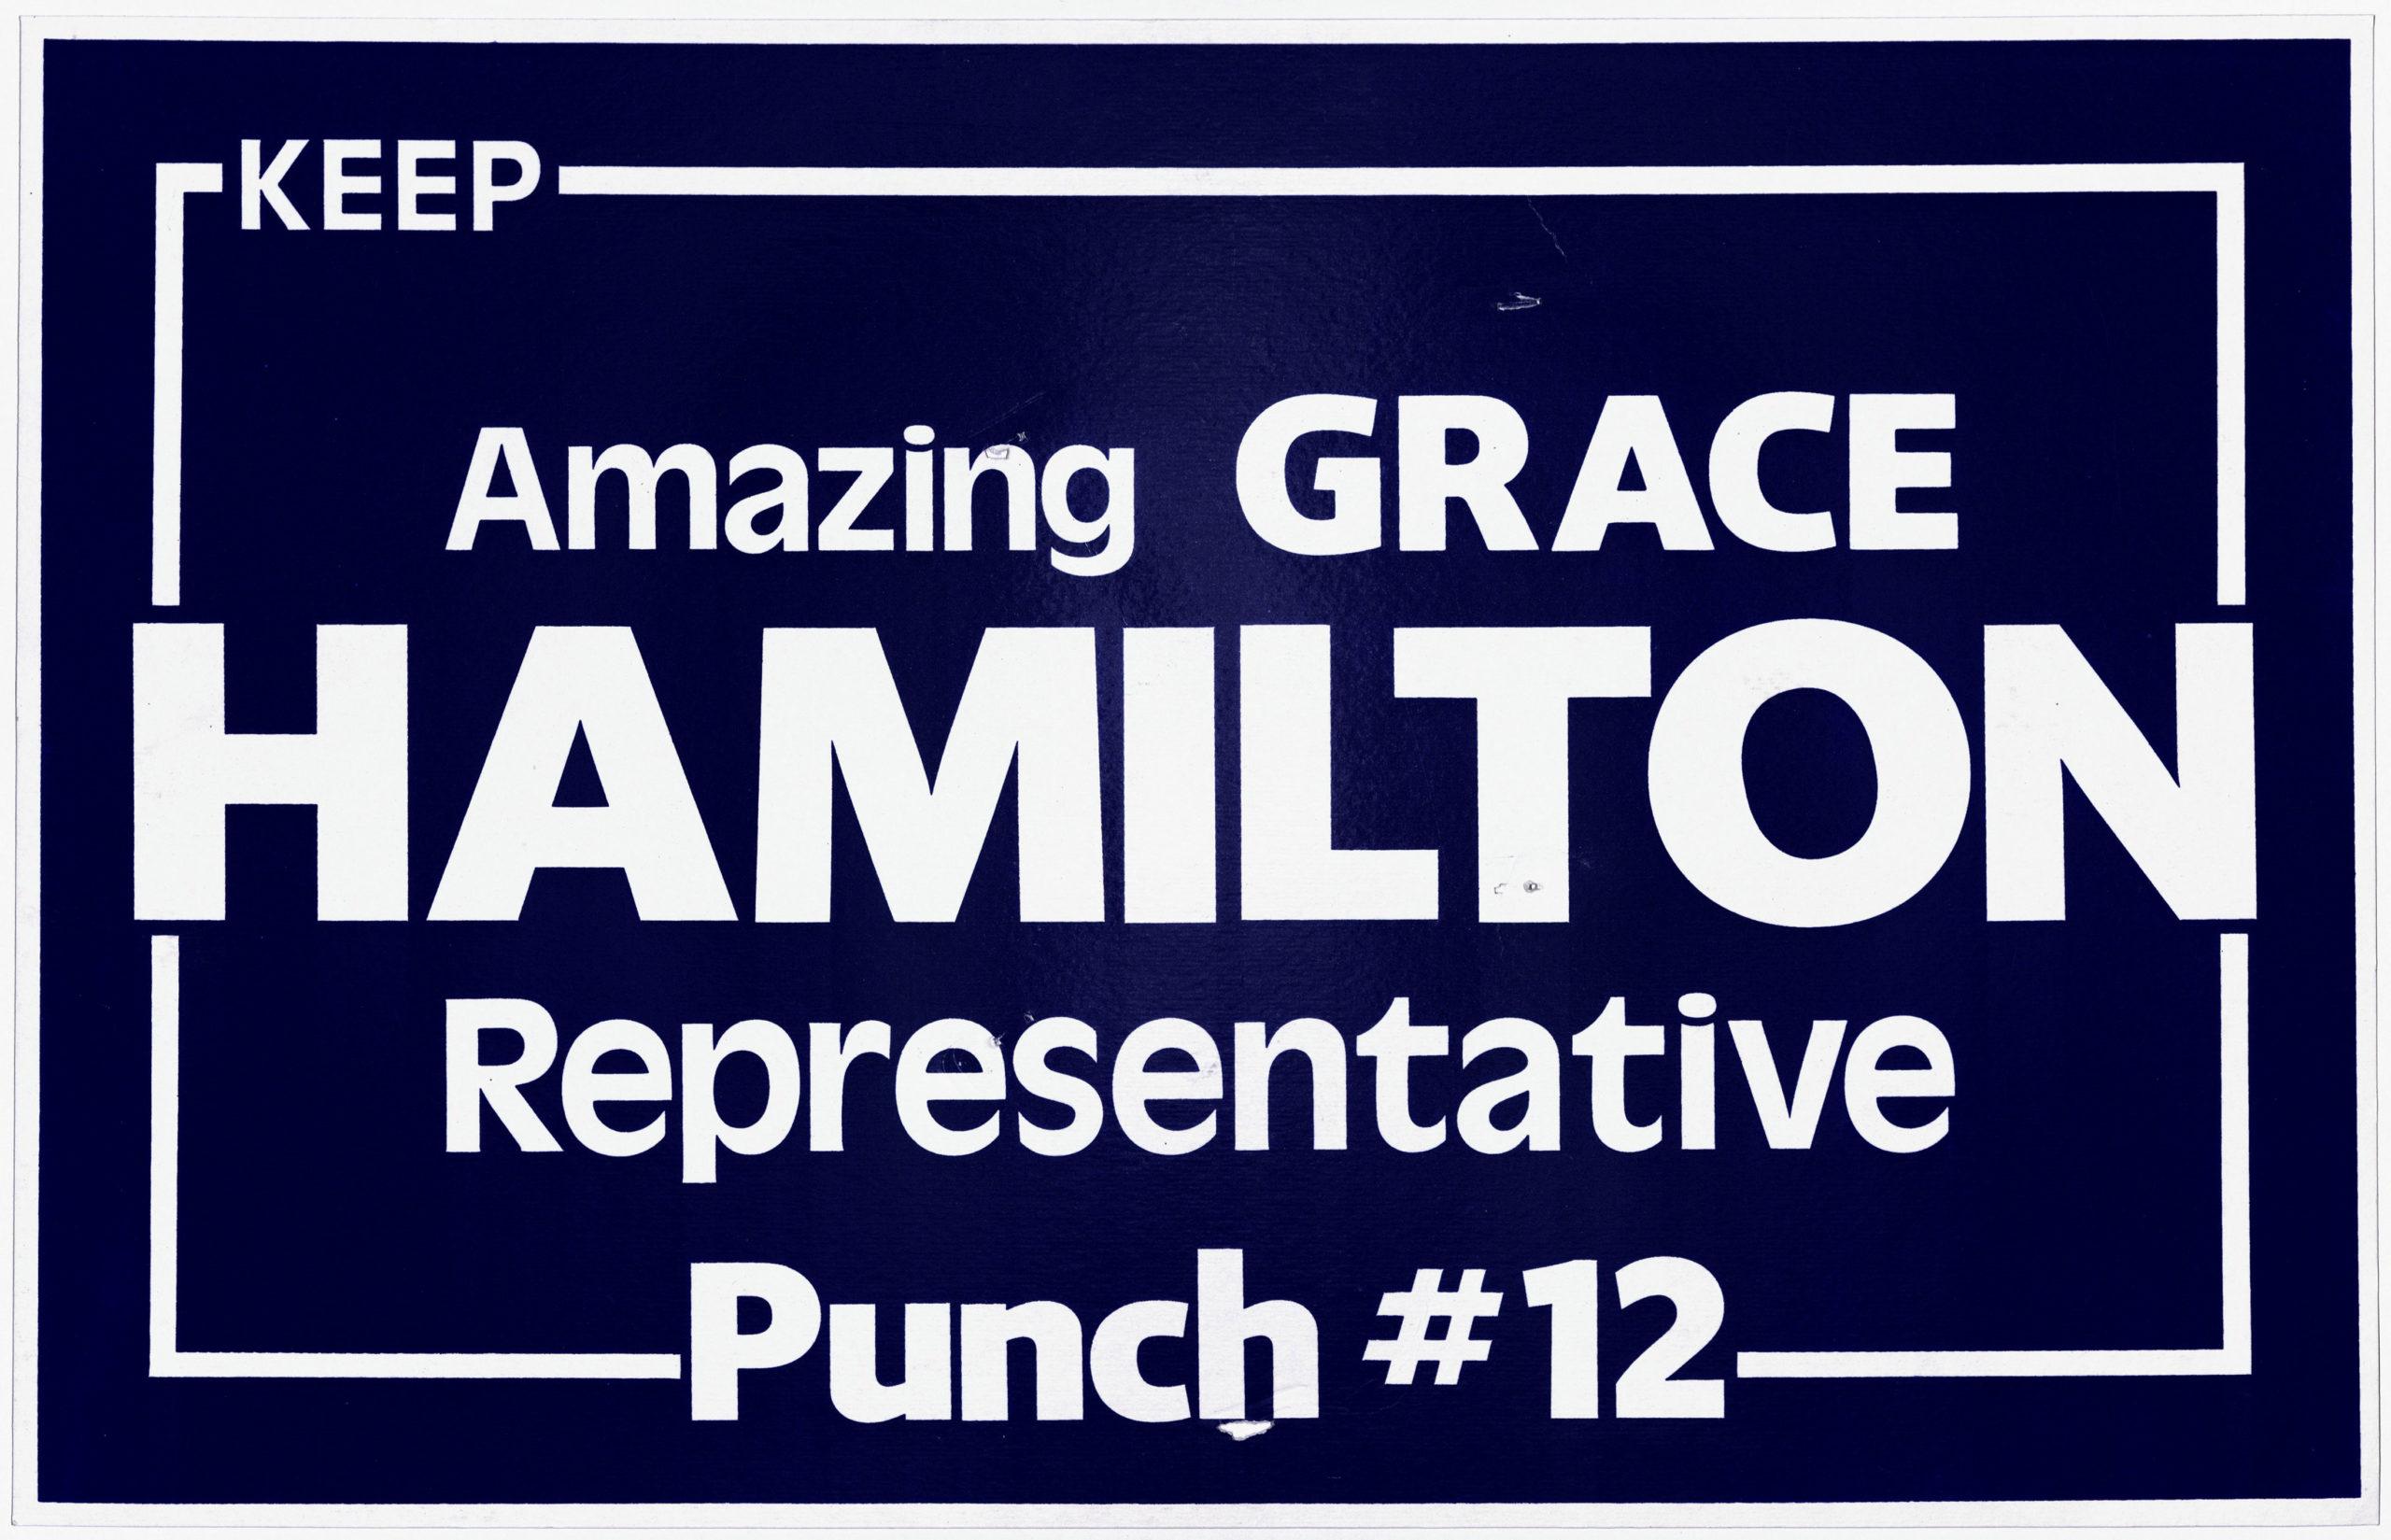 Amazing Grace Hamilton, circa 1984Political Posters Collection